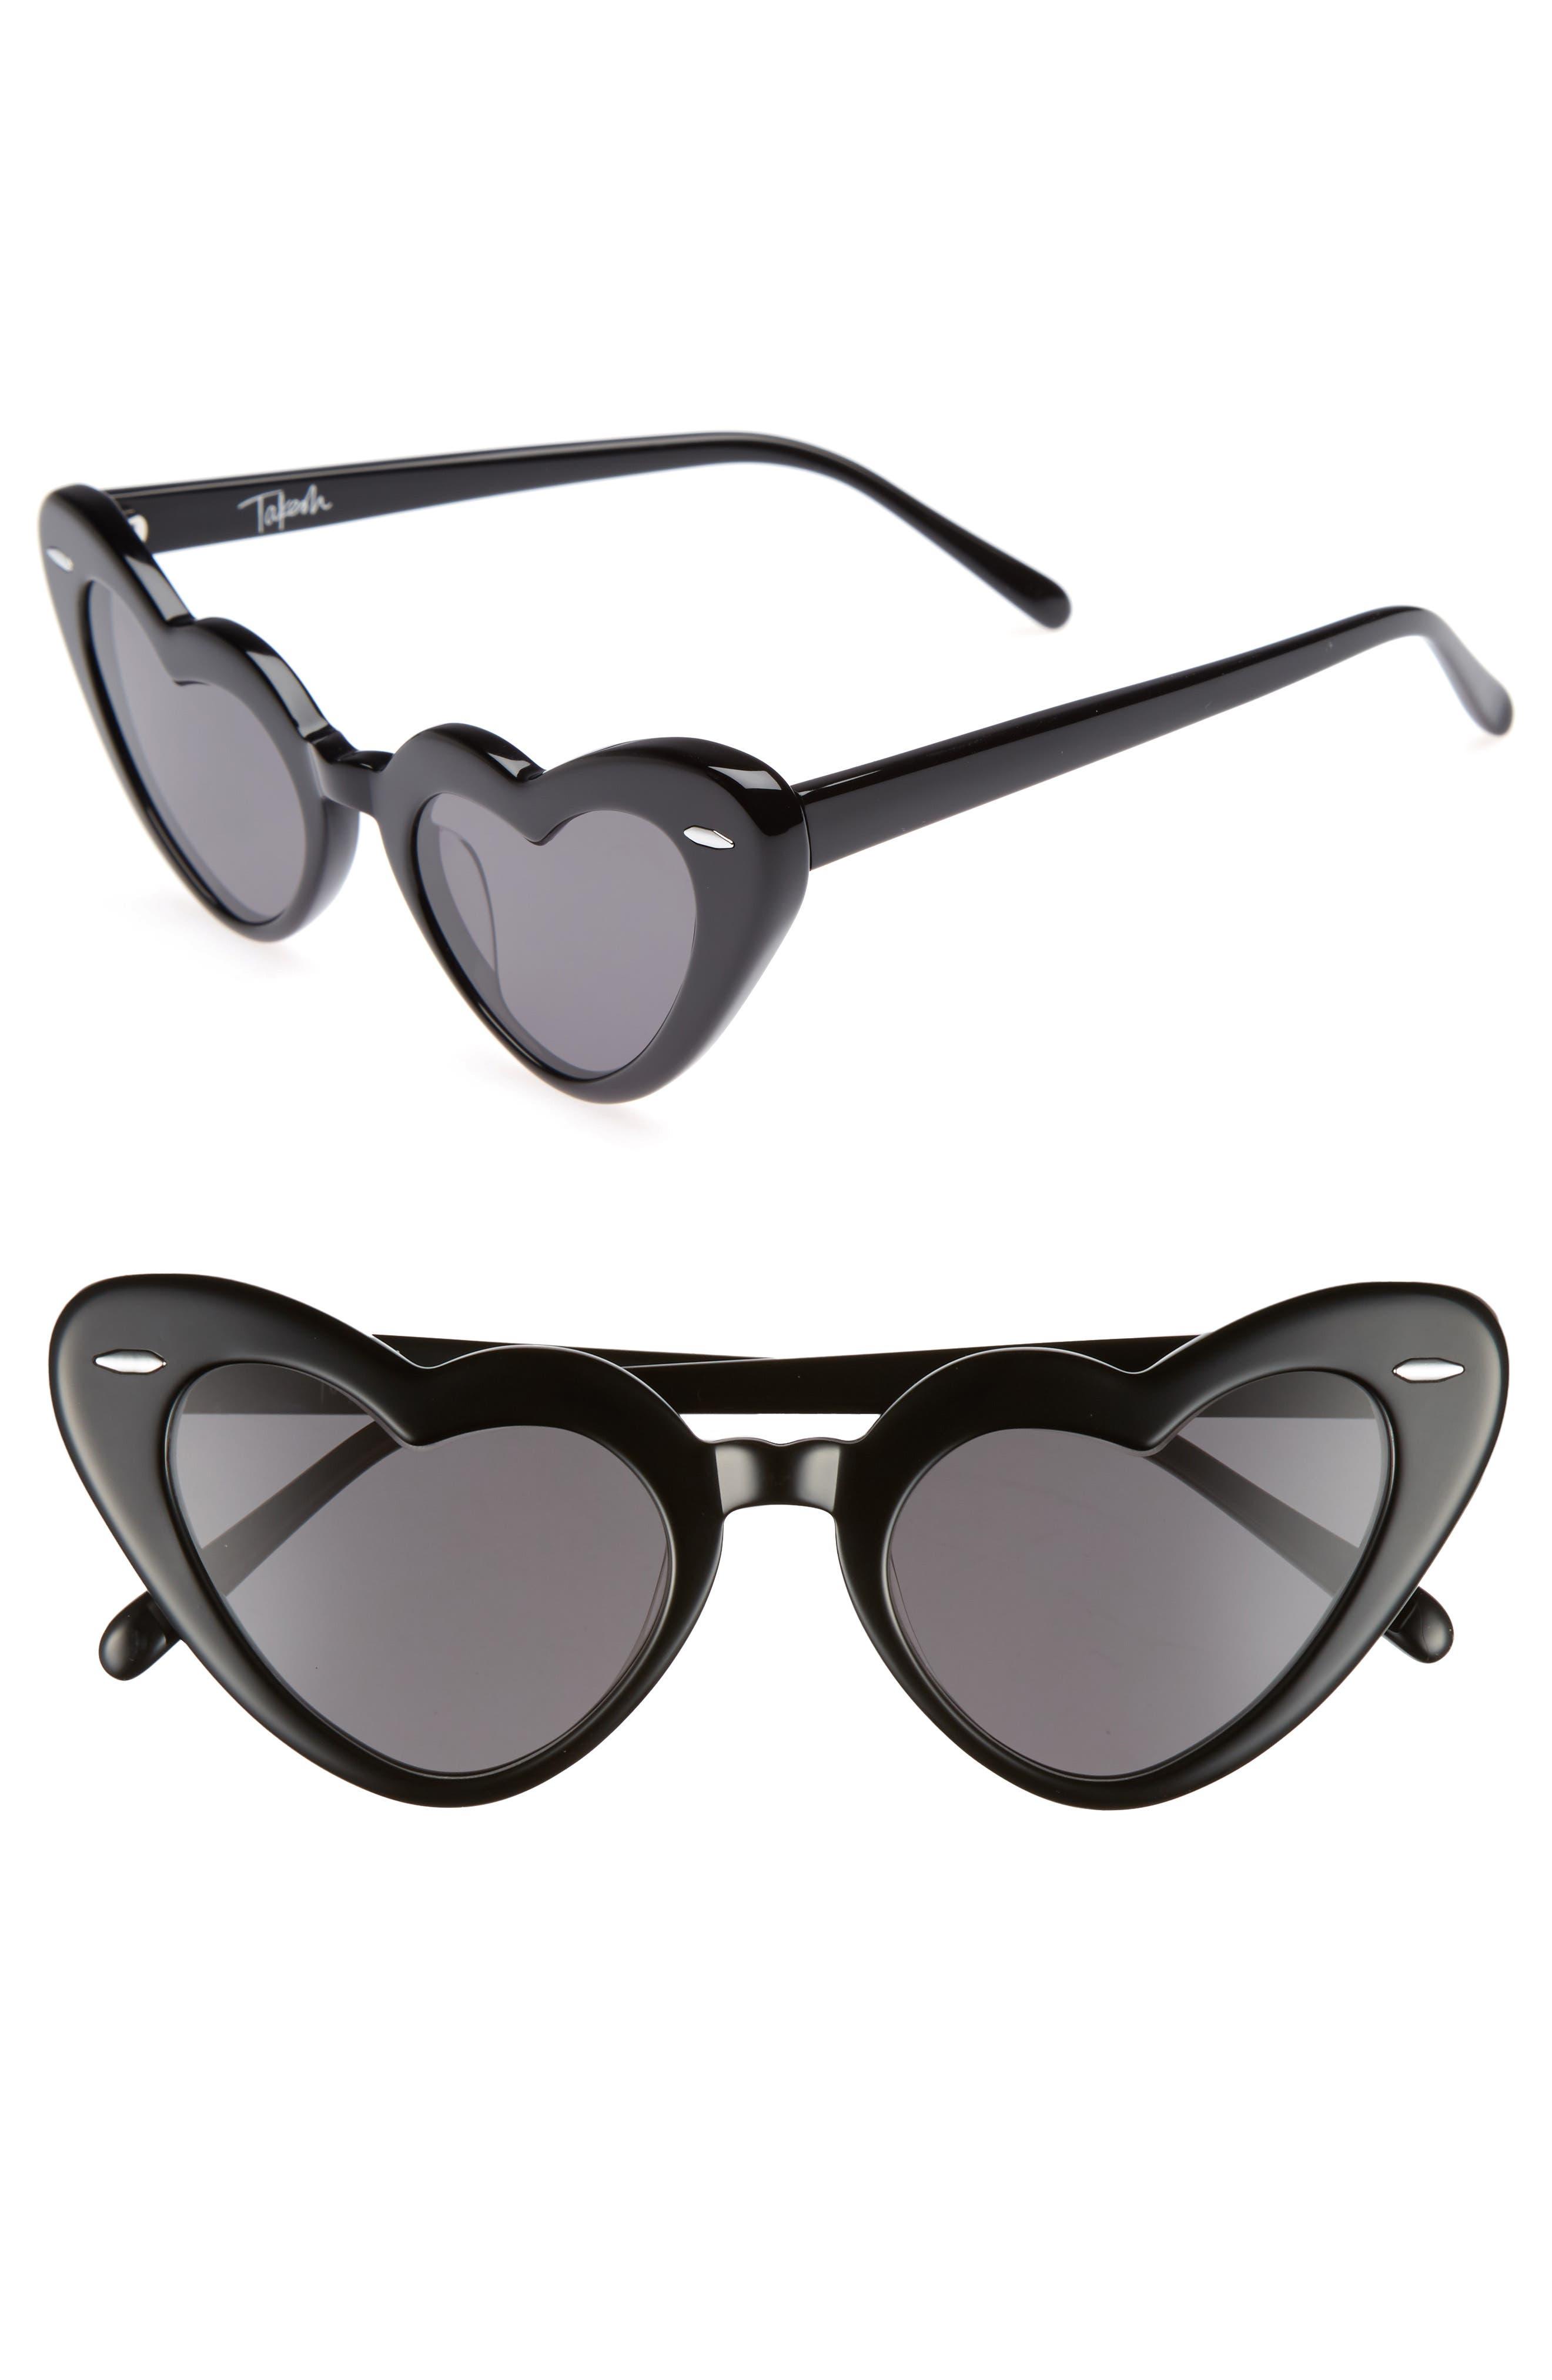 J'adore 46mm Heart Sunglasses,                             Main thumbnail 1, color,                             001